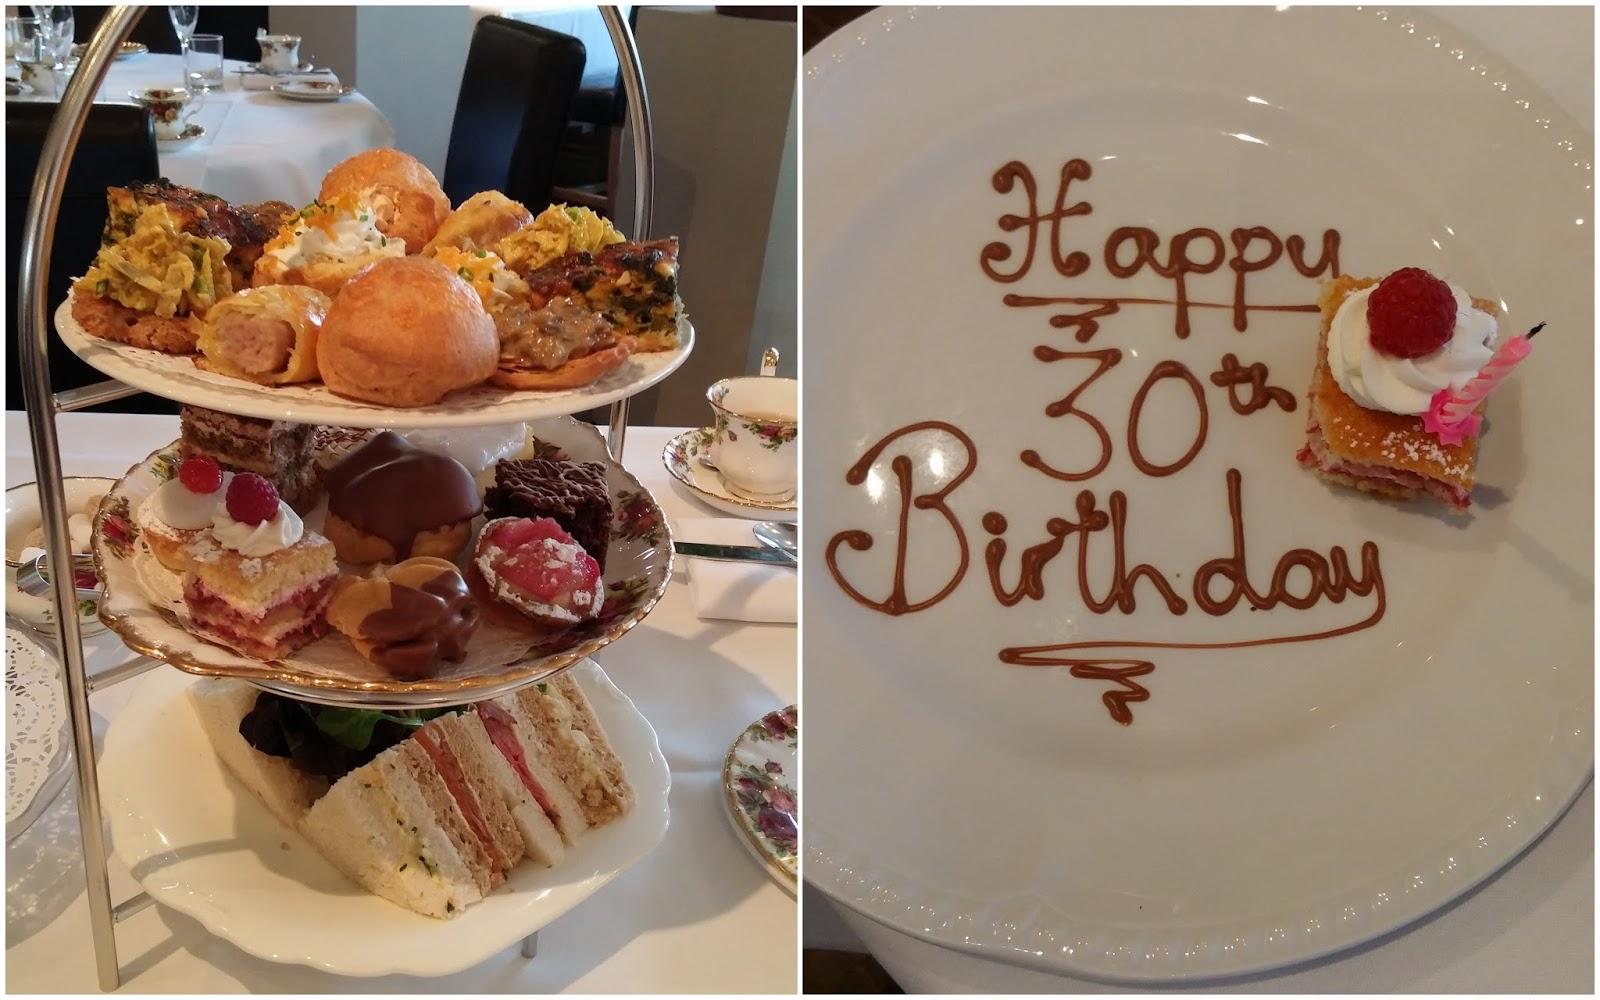 High Tea at the Angel Hotel Abergavenny 30th birthday celebrations